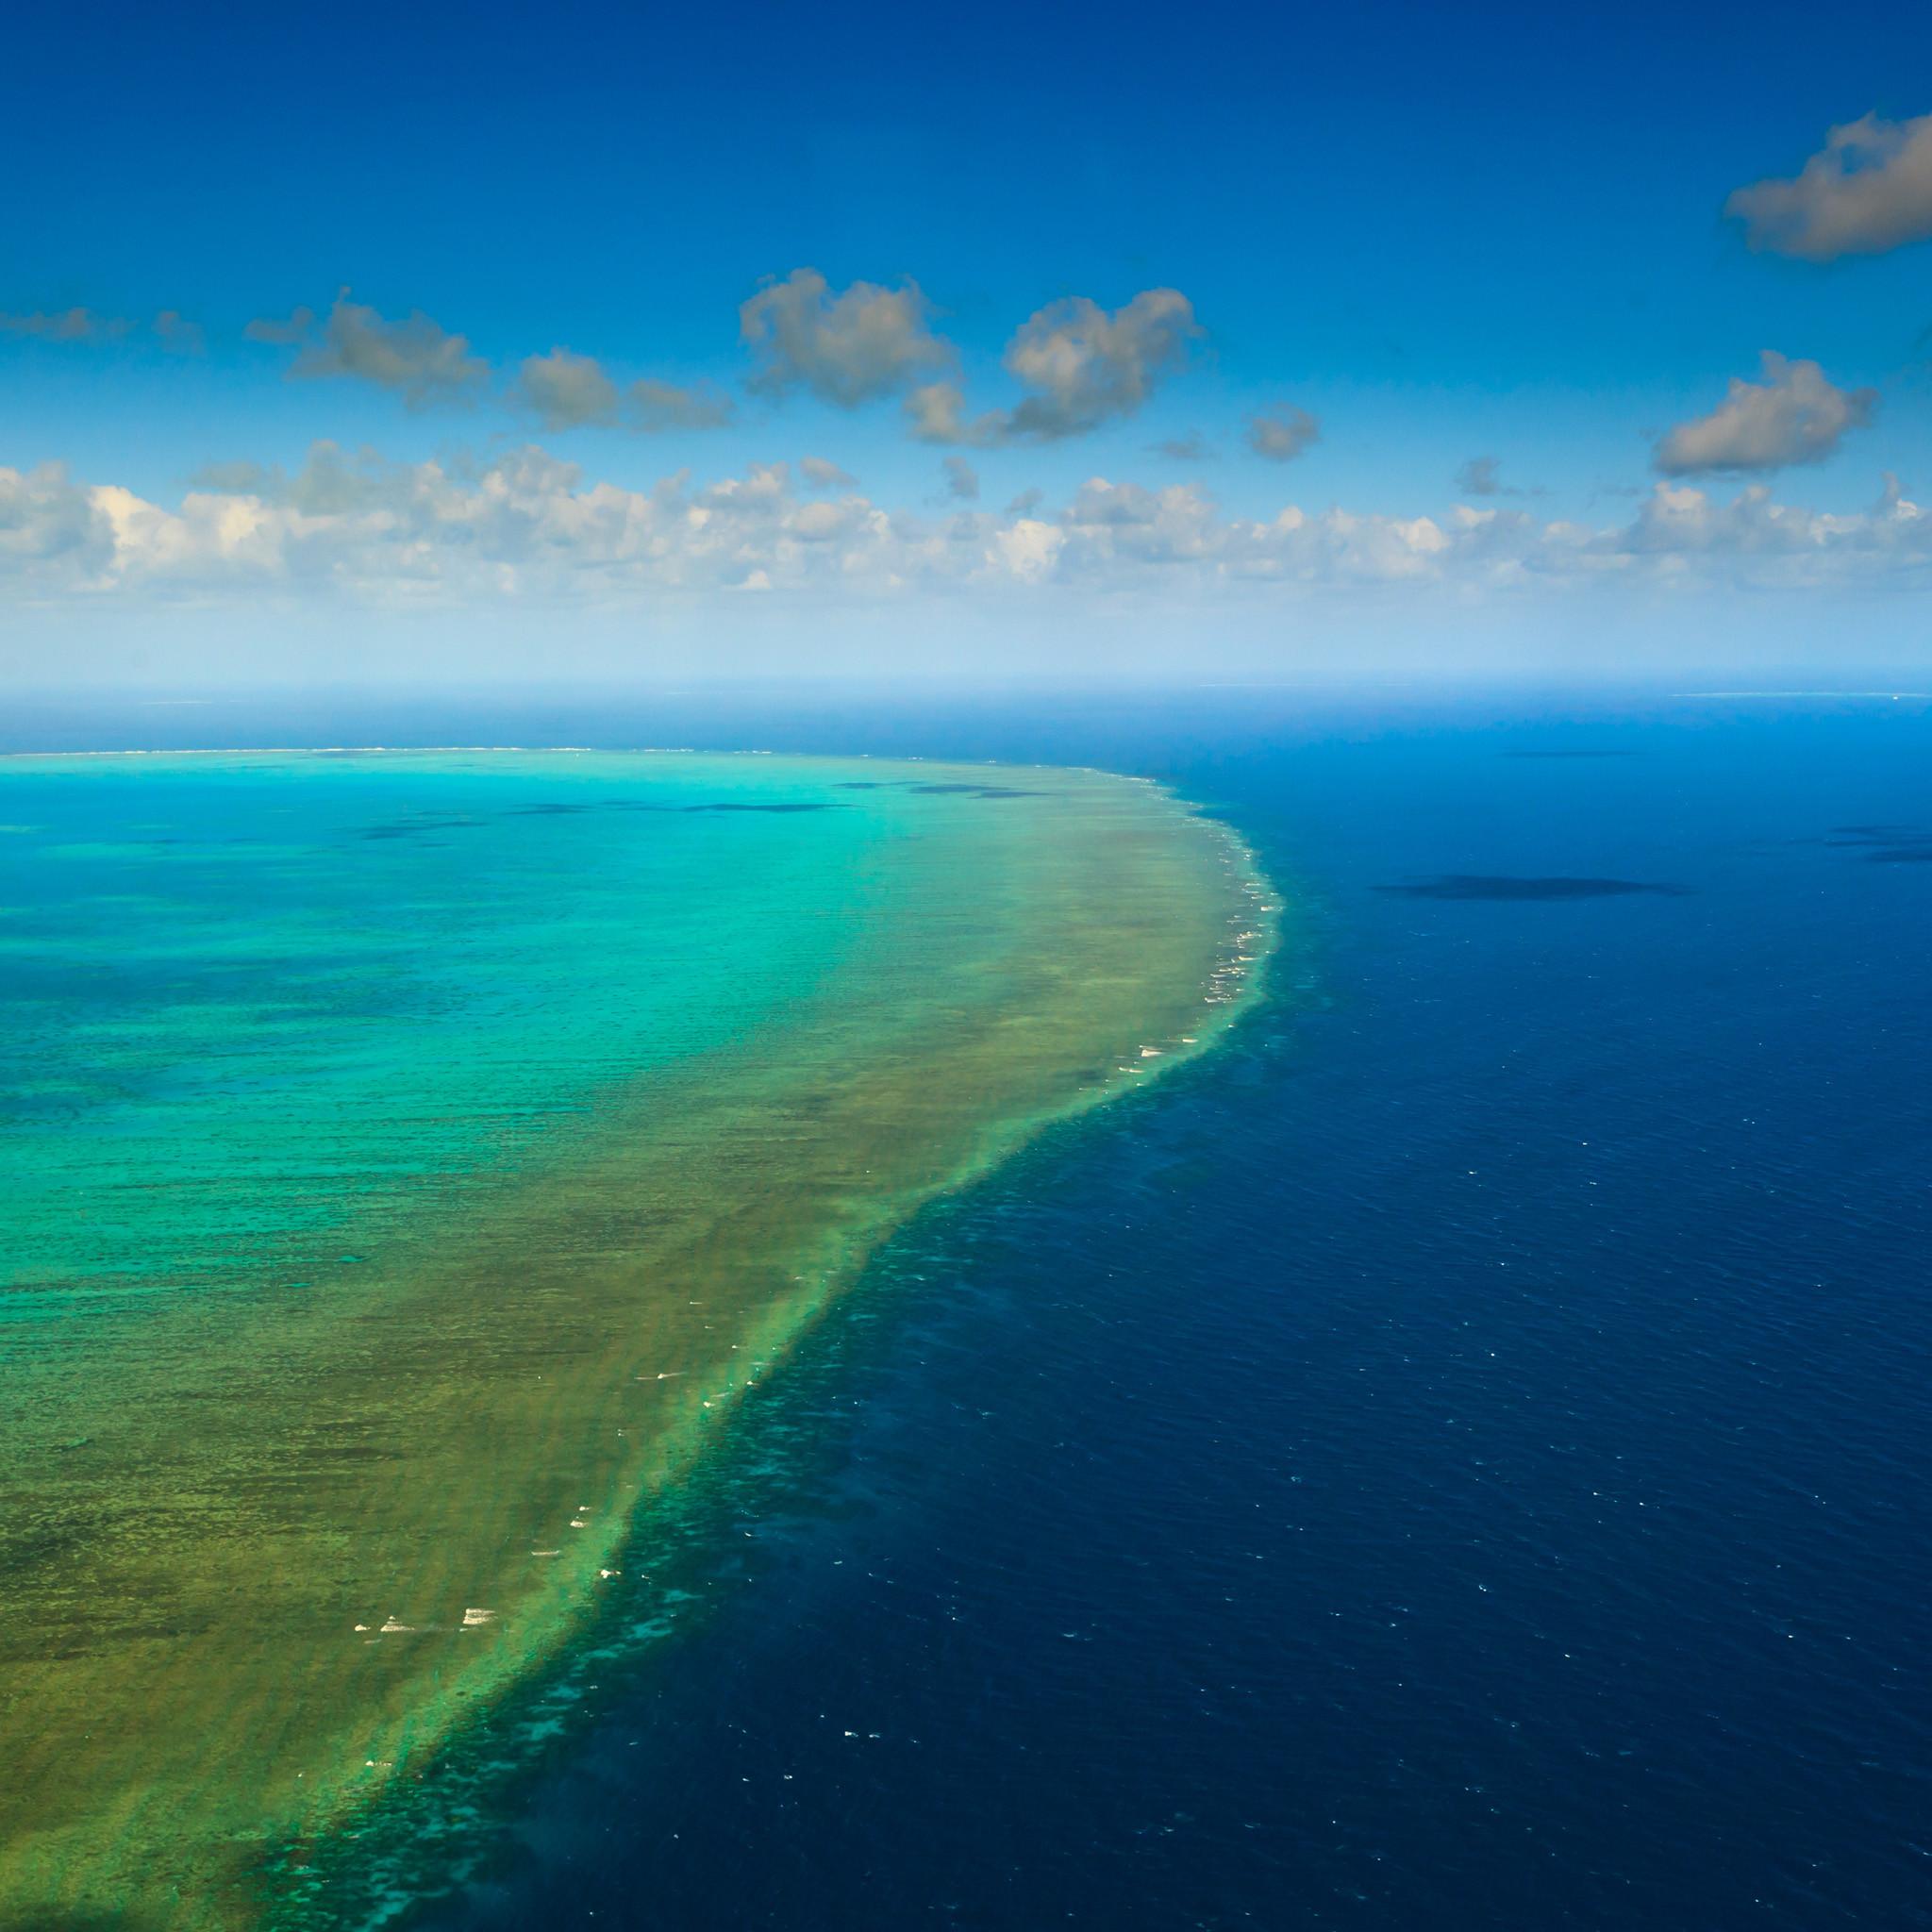 Wallpapersafari: Great Barrier Reef Wallpaper